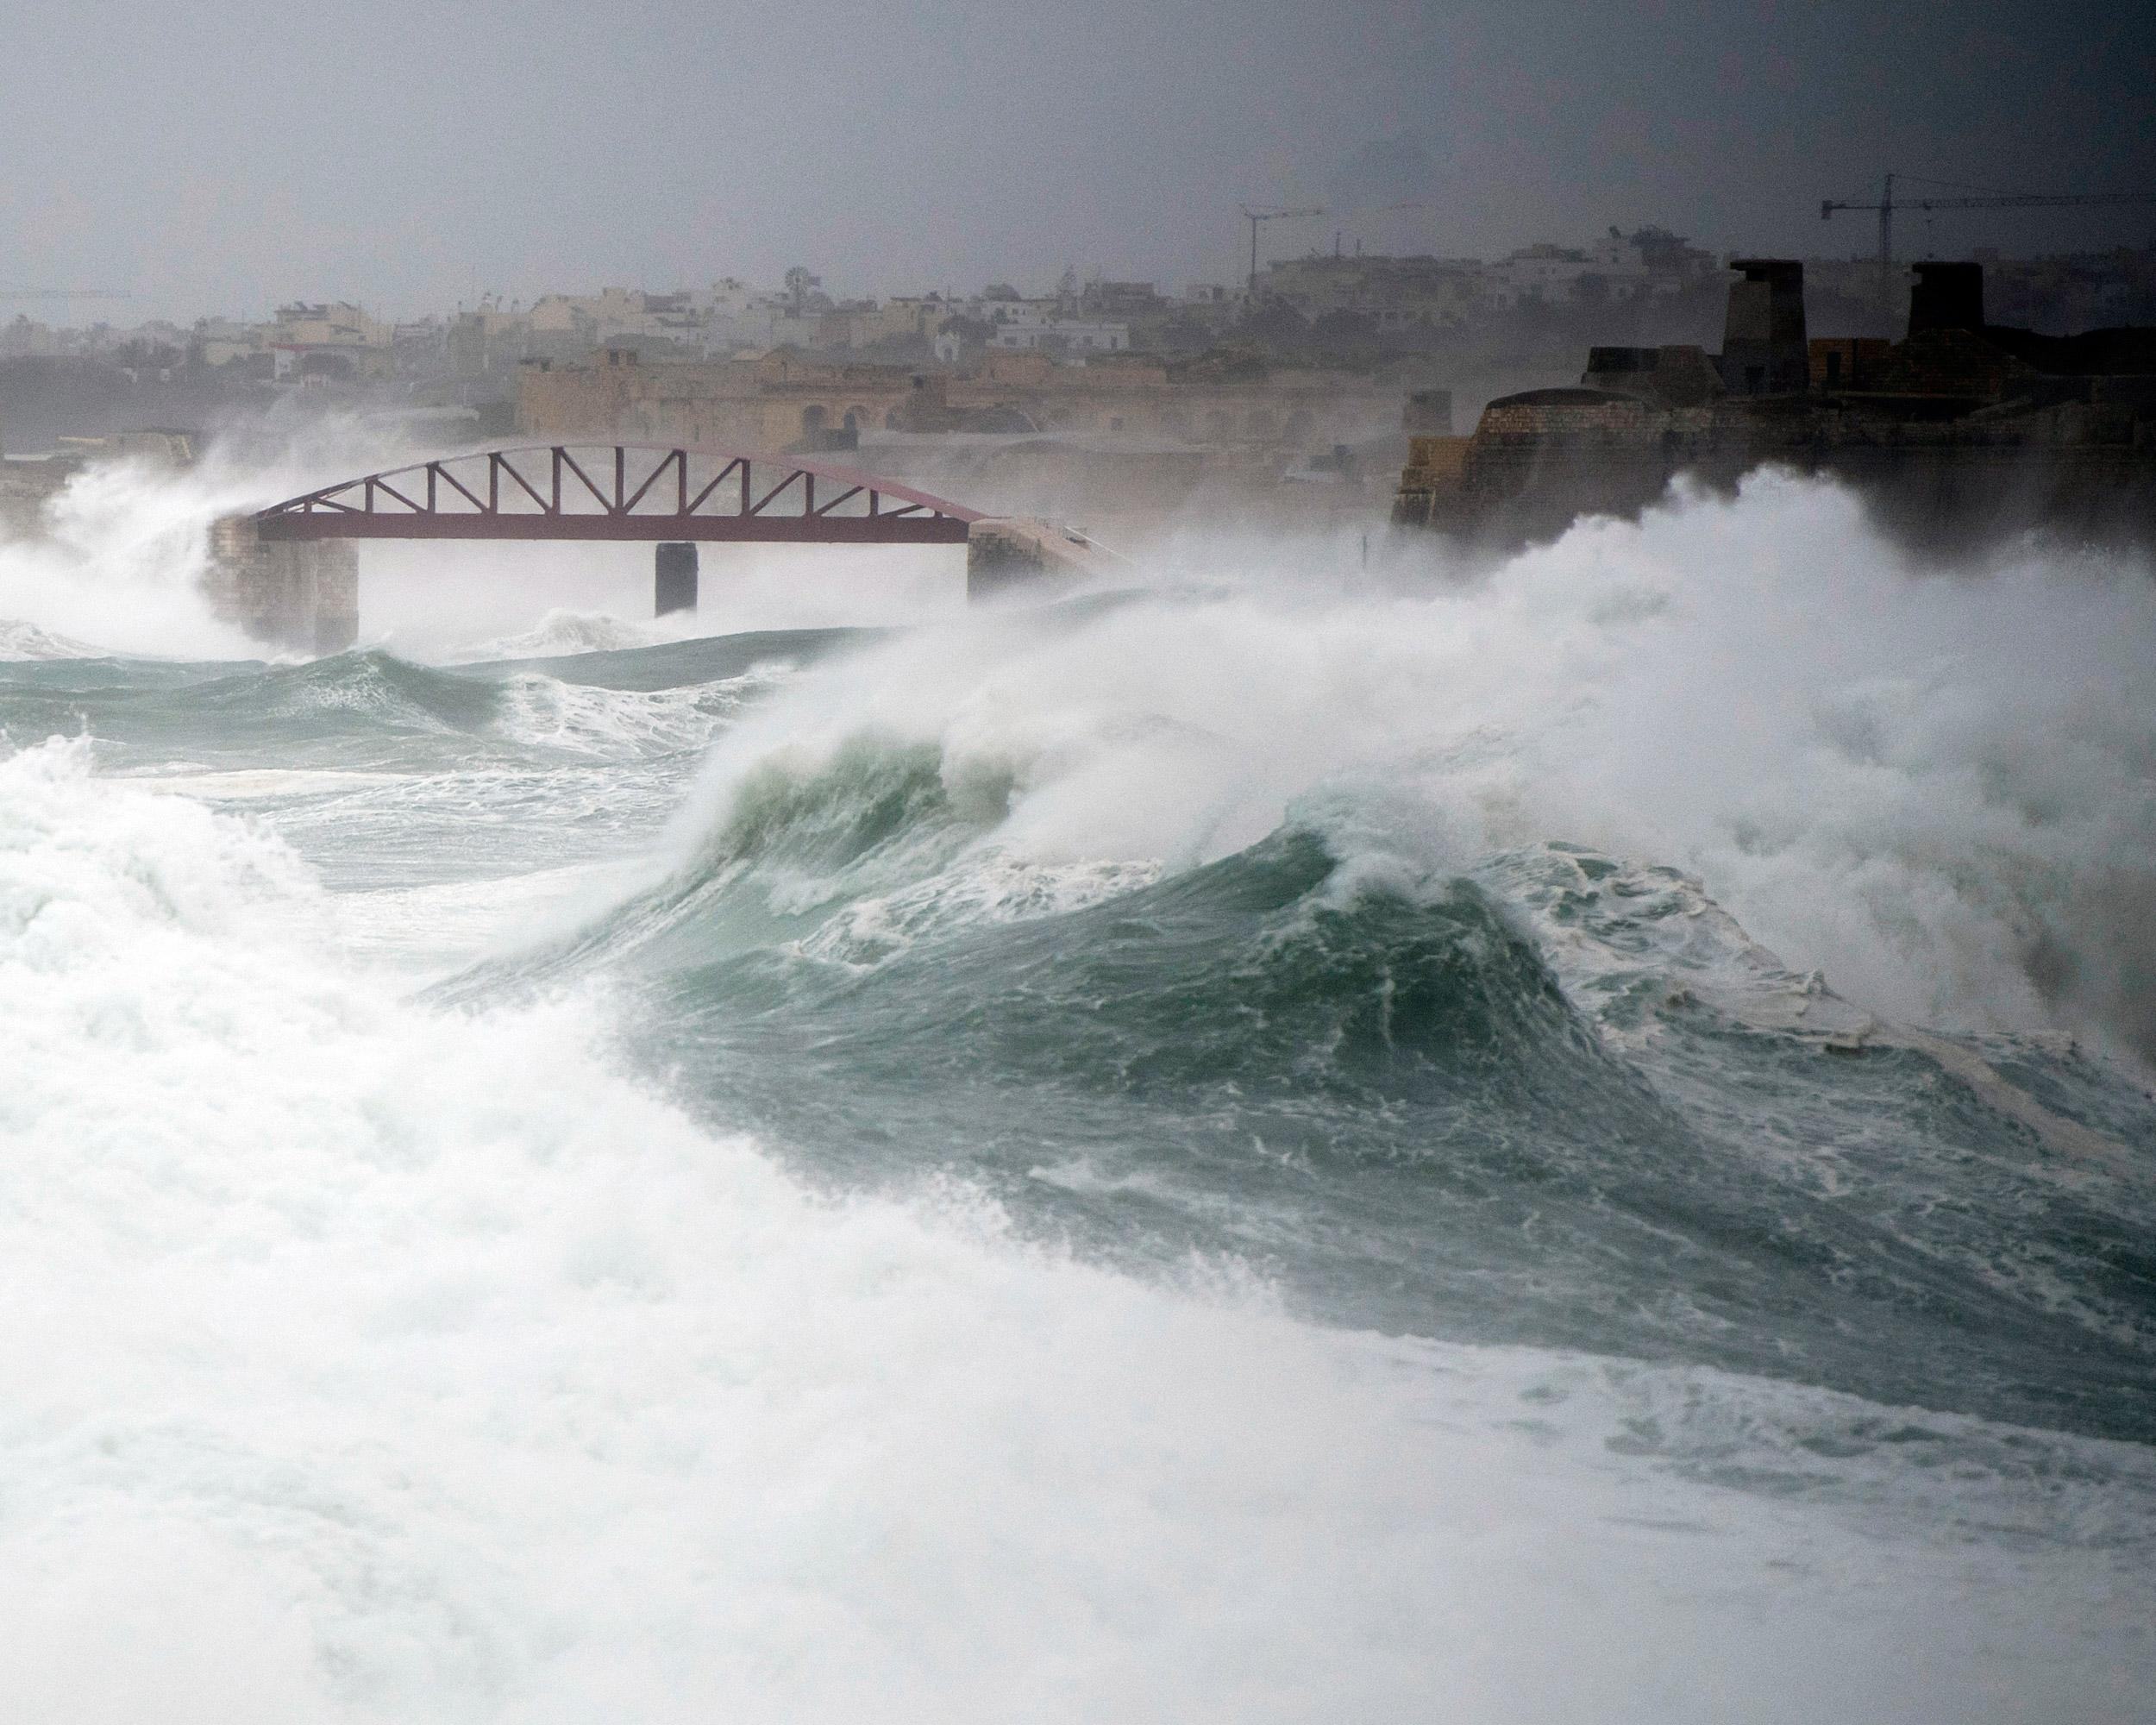 Malta Sturm